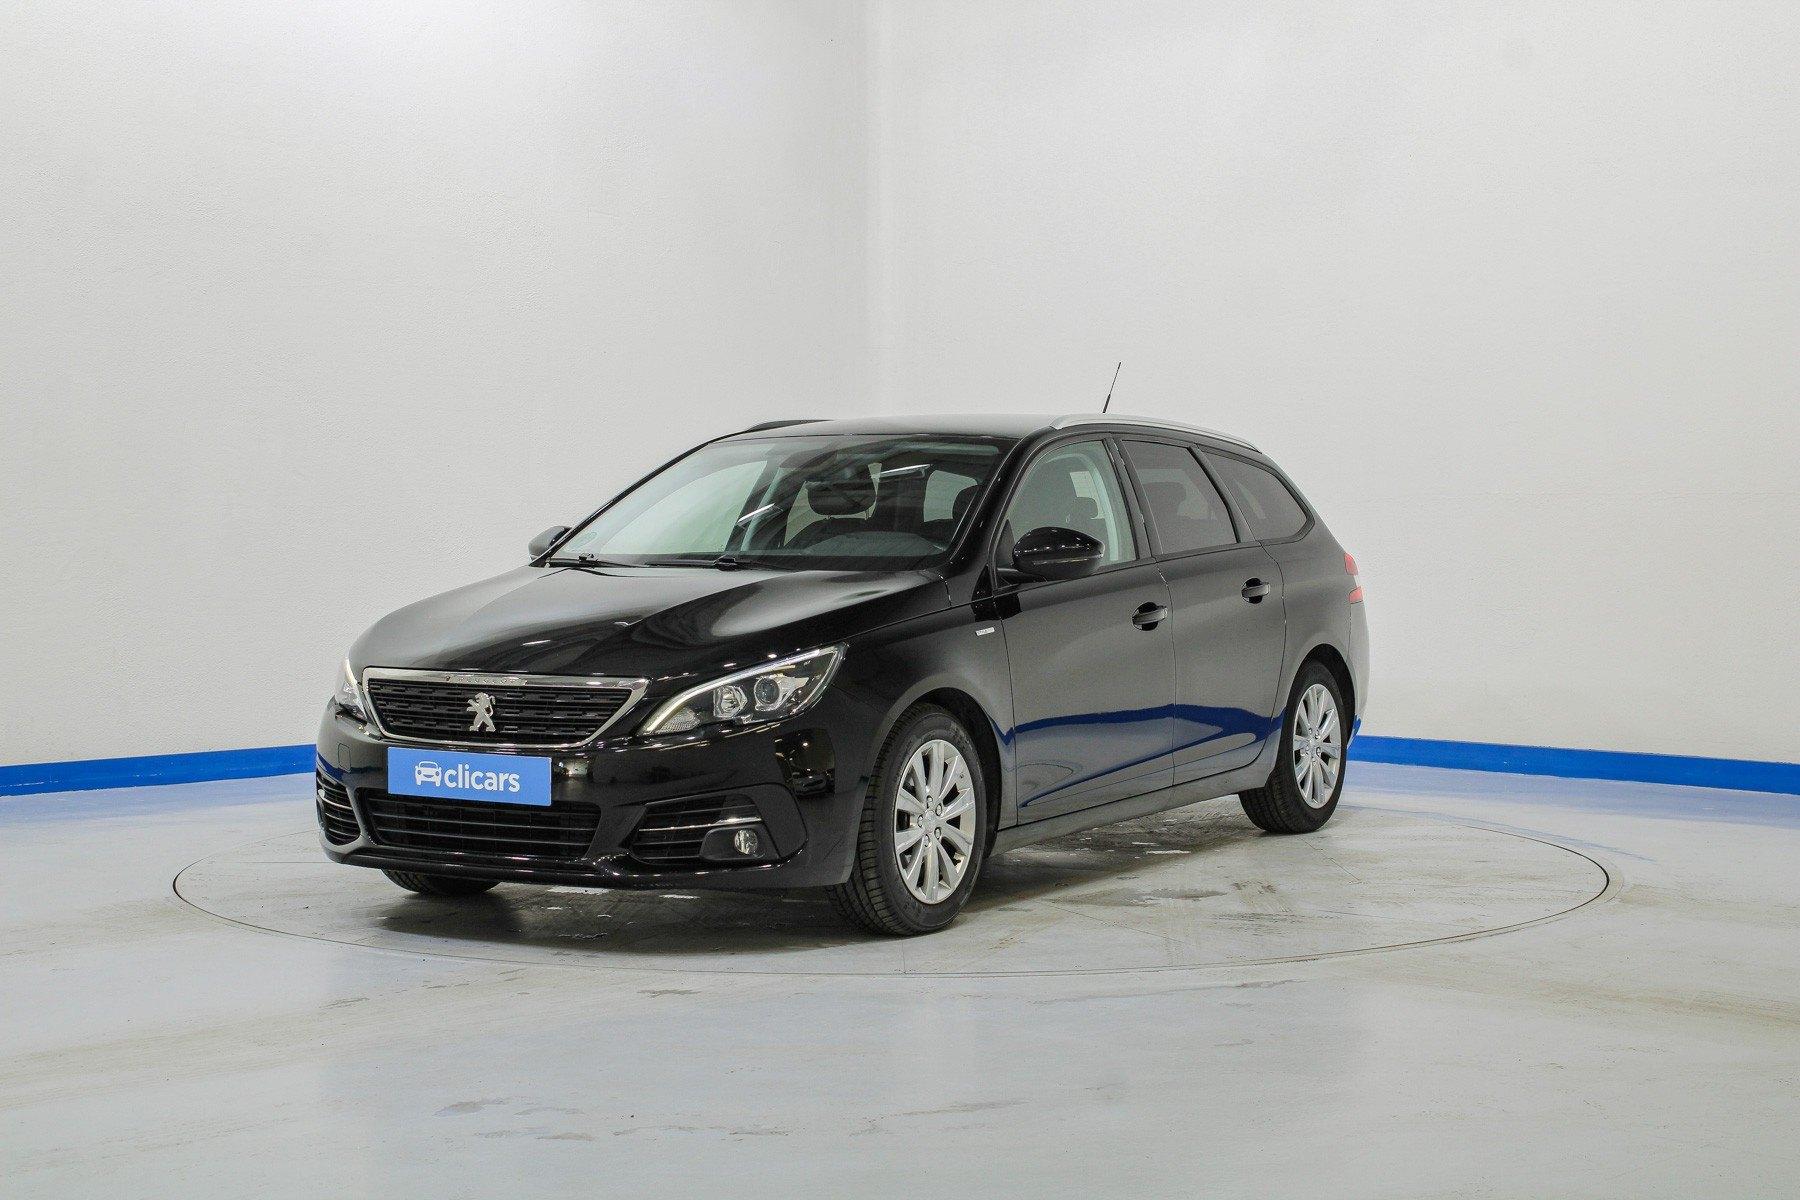 Peugeot 308 Gasolina SW Style 1.2 PureTech 96KW (130CV) 1